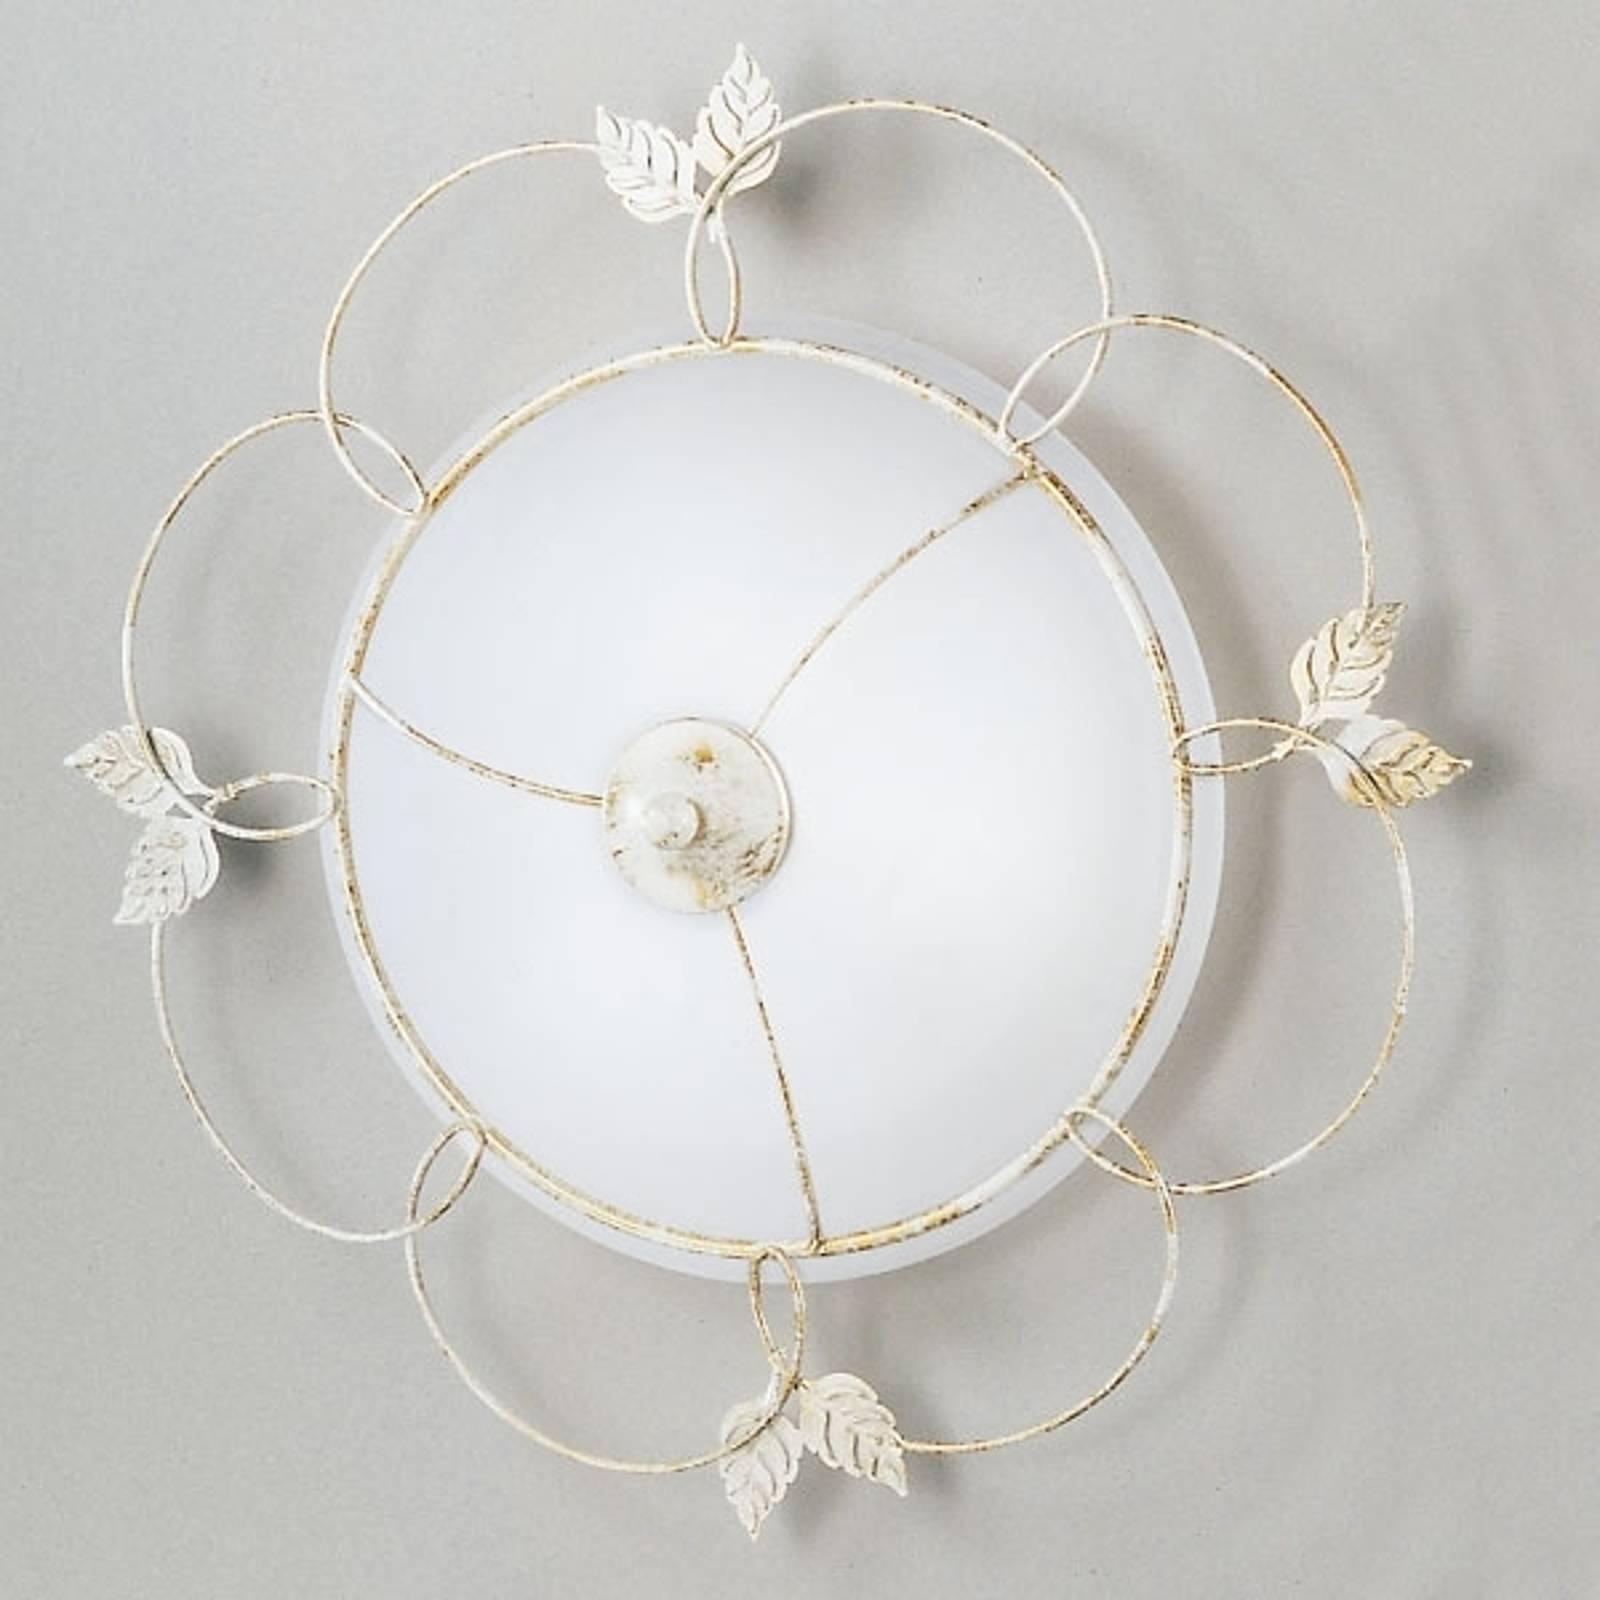 Lampa sufitowa FLORA Design by Kögl